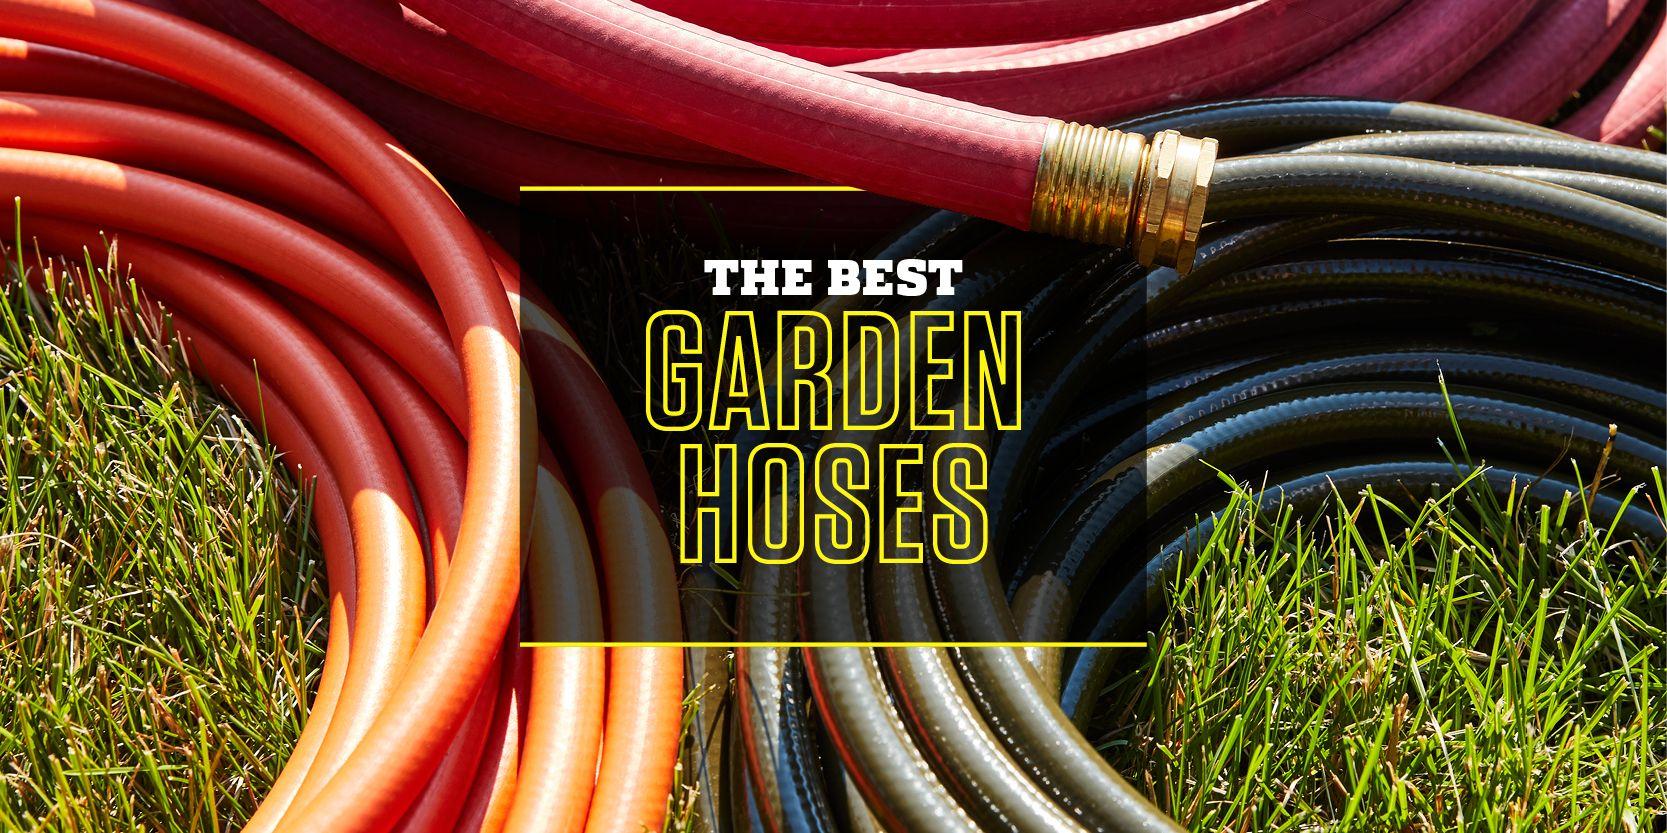 Best Garden Hoses 2020 10 Water Hoses Reviewed